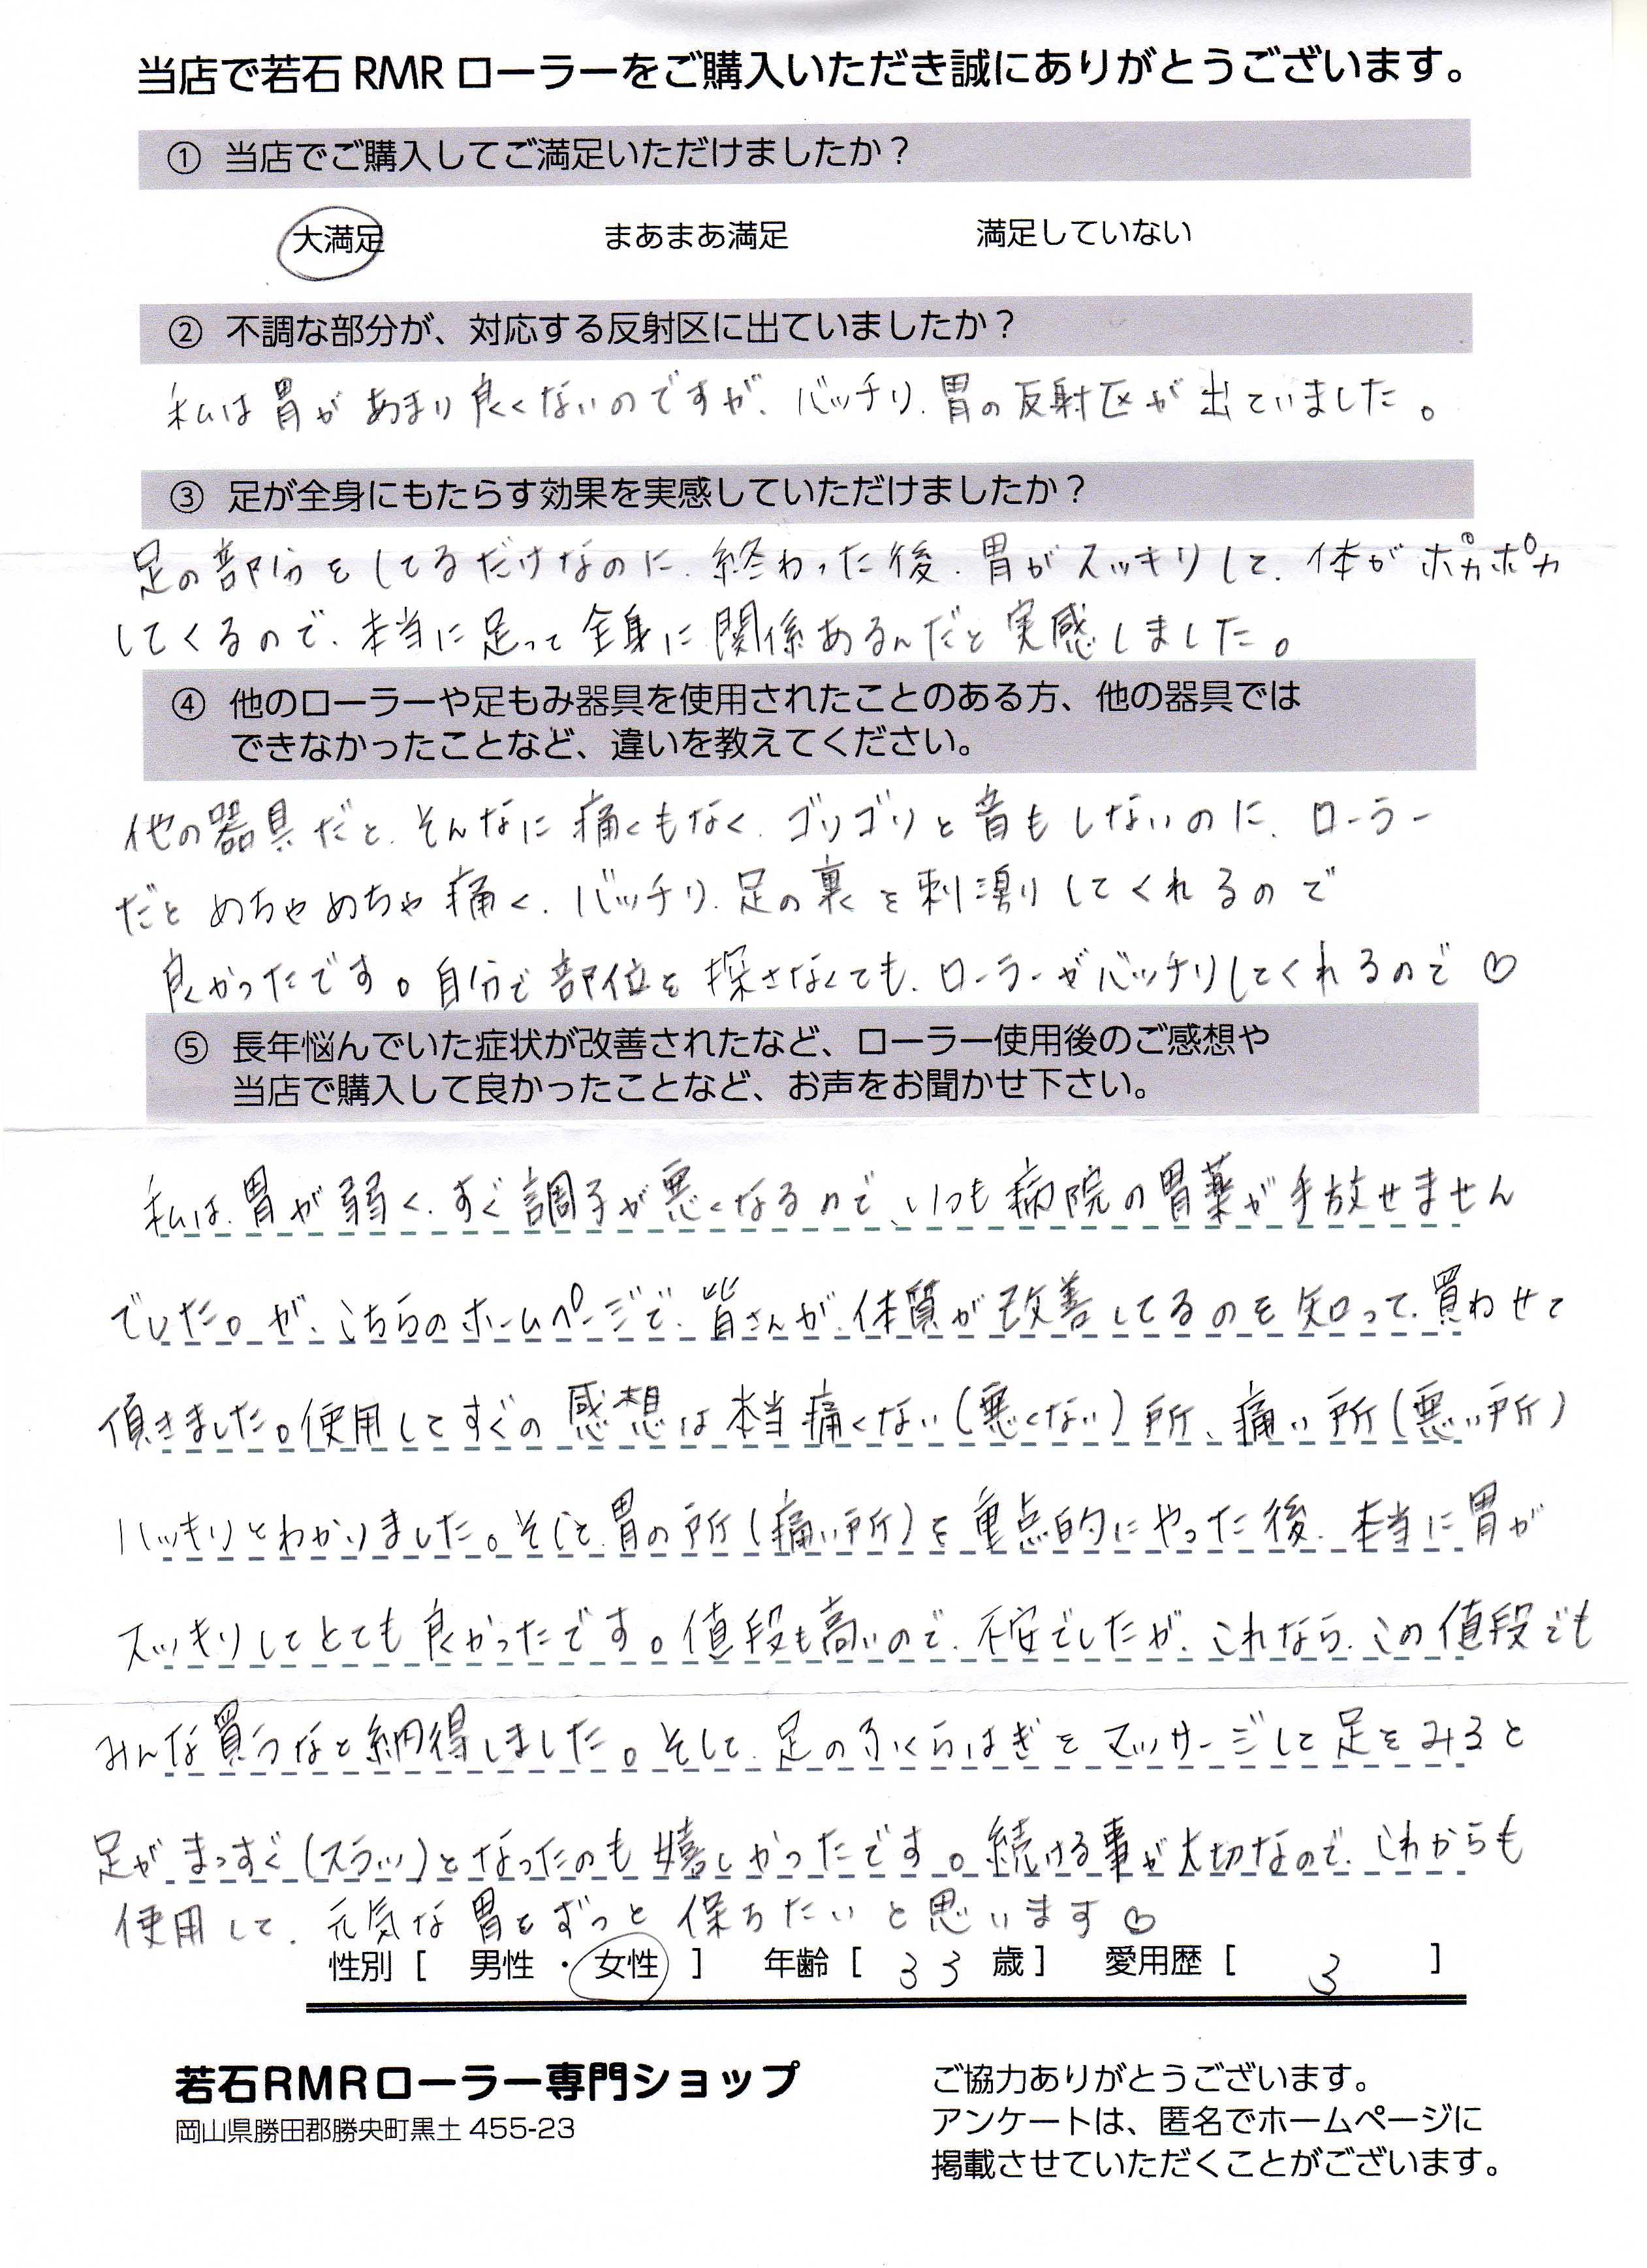 http://www.jakuseki-rmr.com/mt_img/anke-to1001.jpg